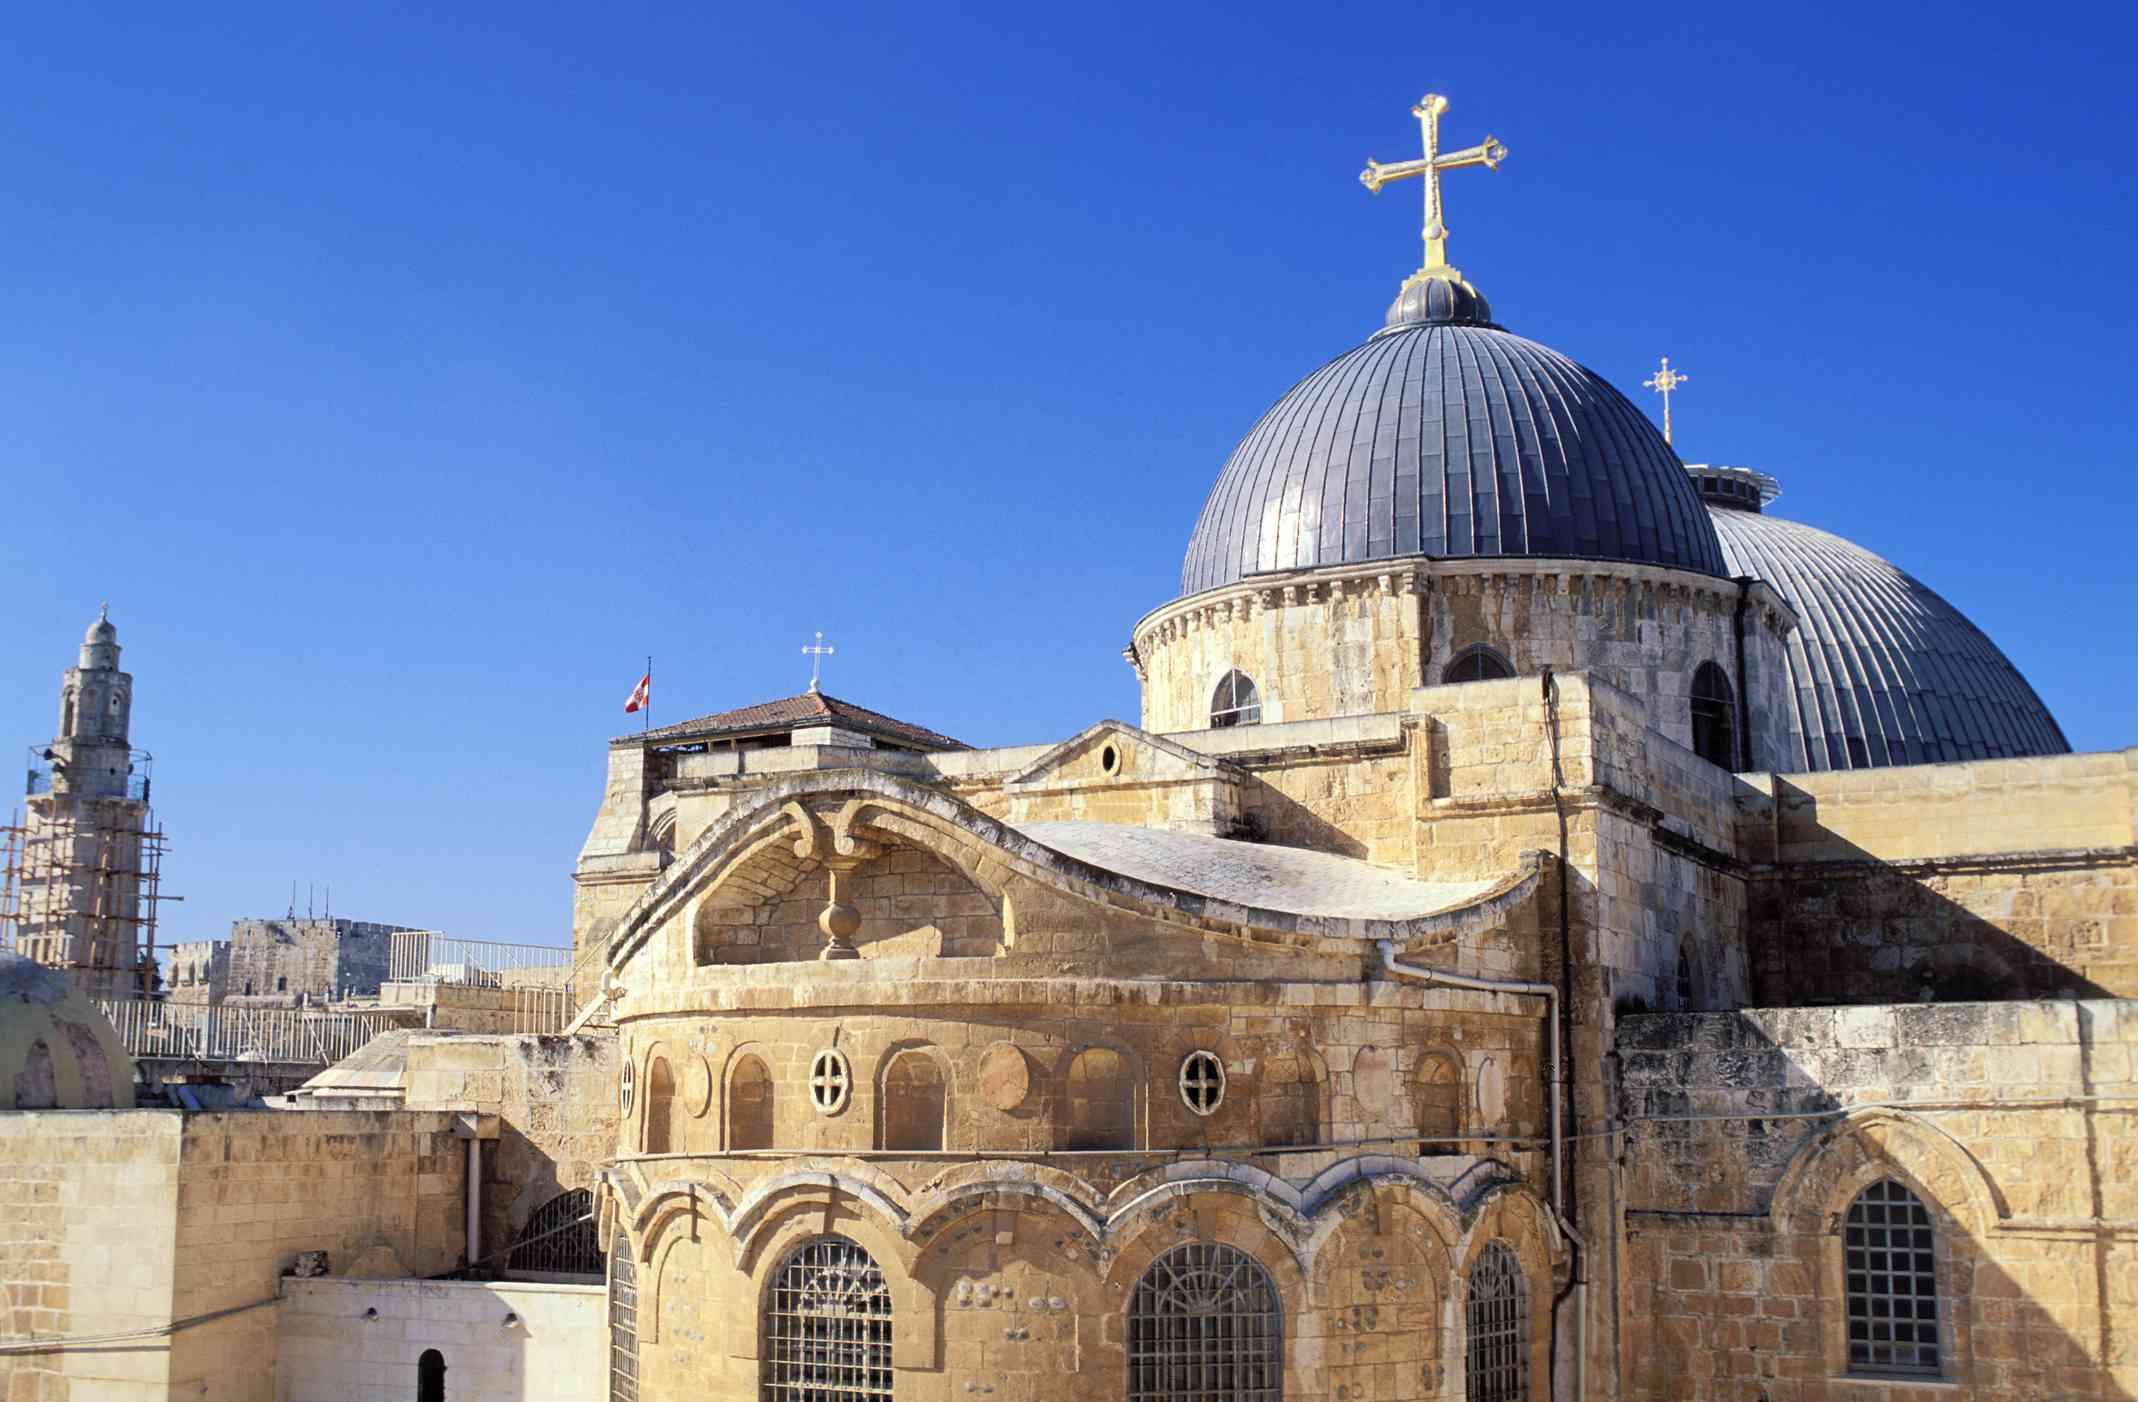 Israel, Jerusalem, Church of the Holy Sepulcher in the Old City of Jerusalem